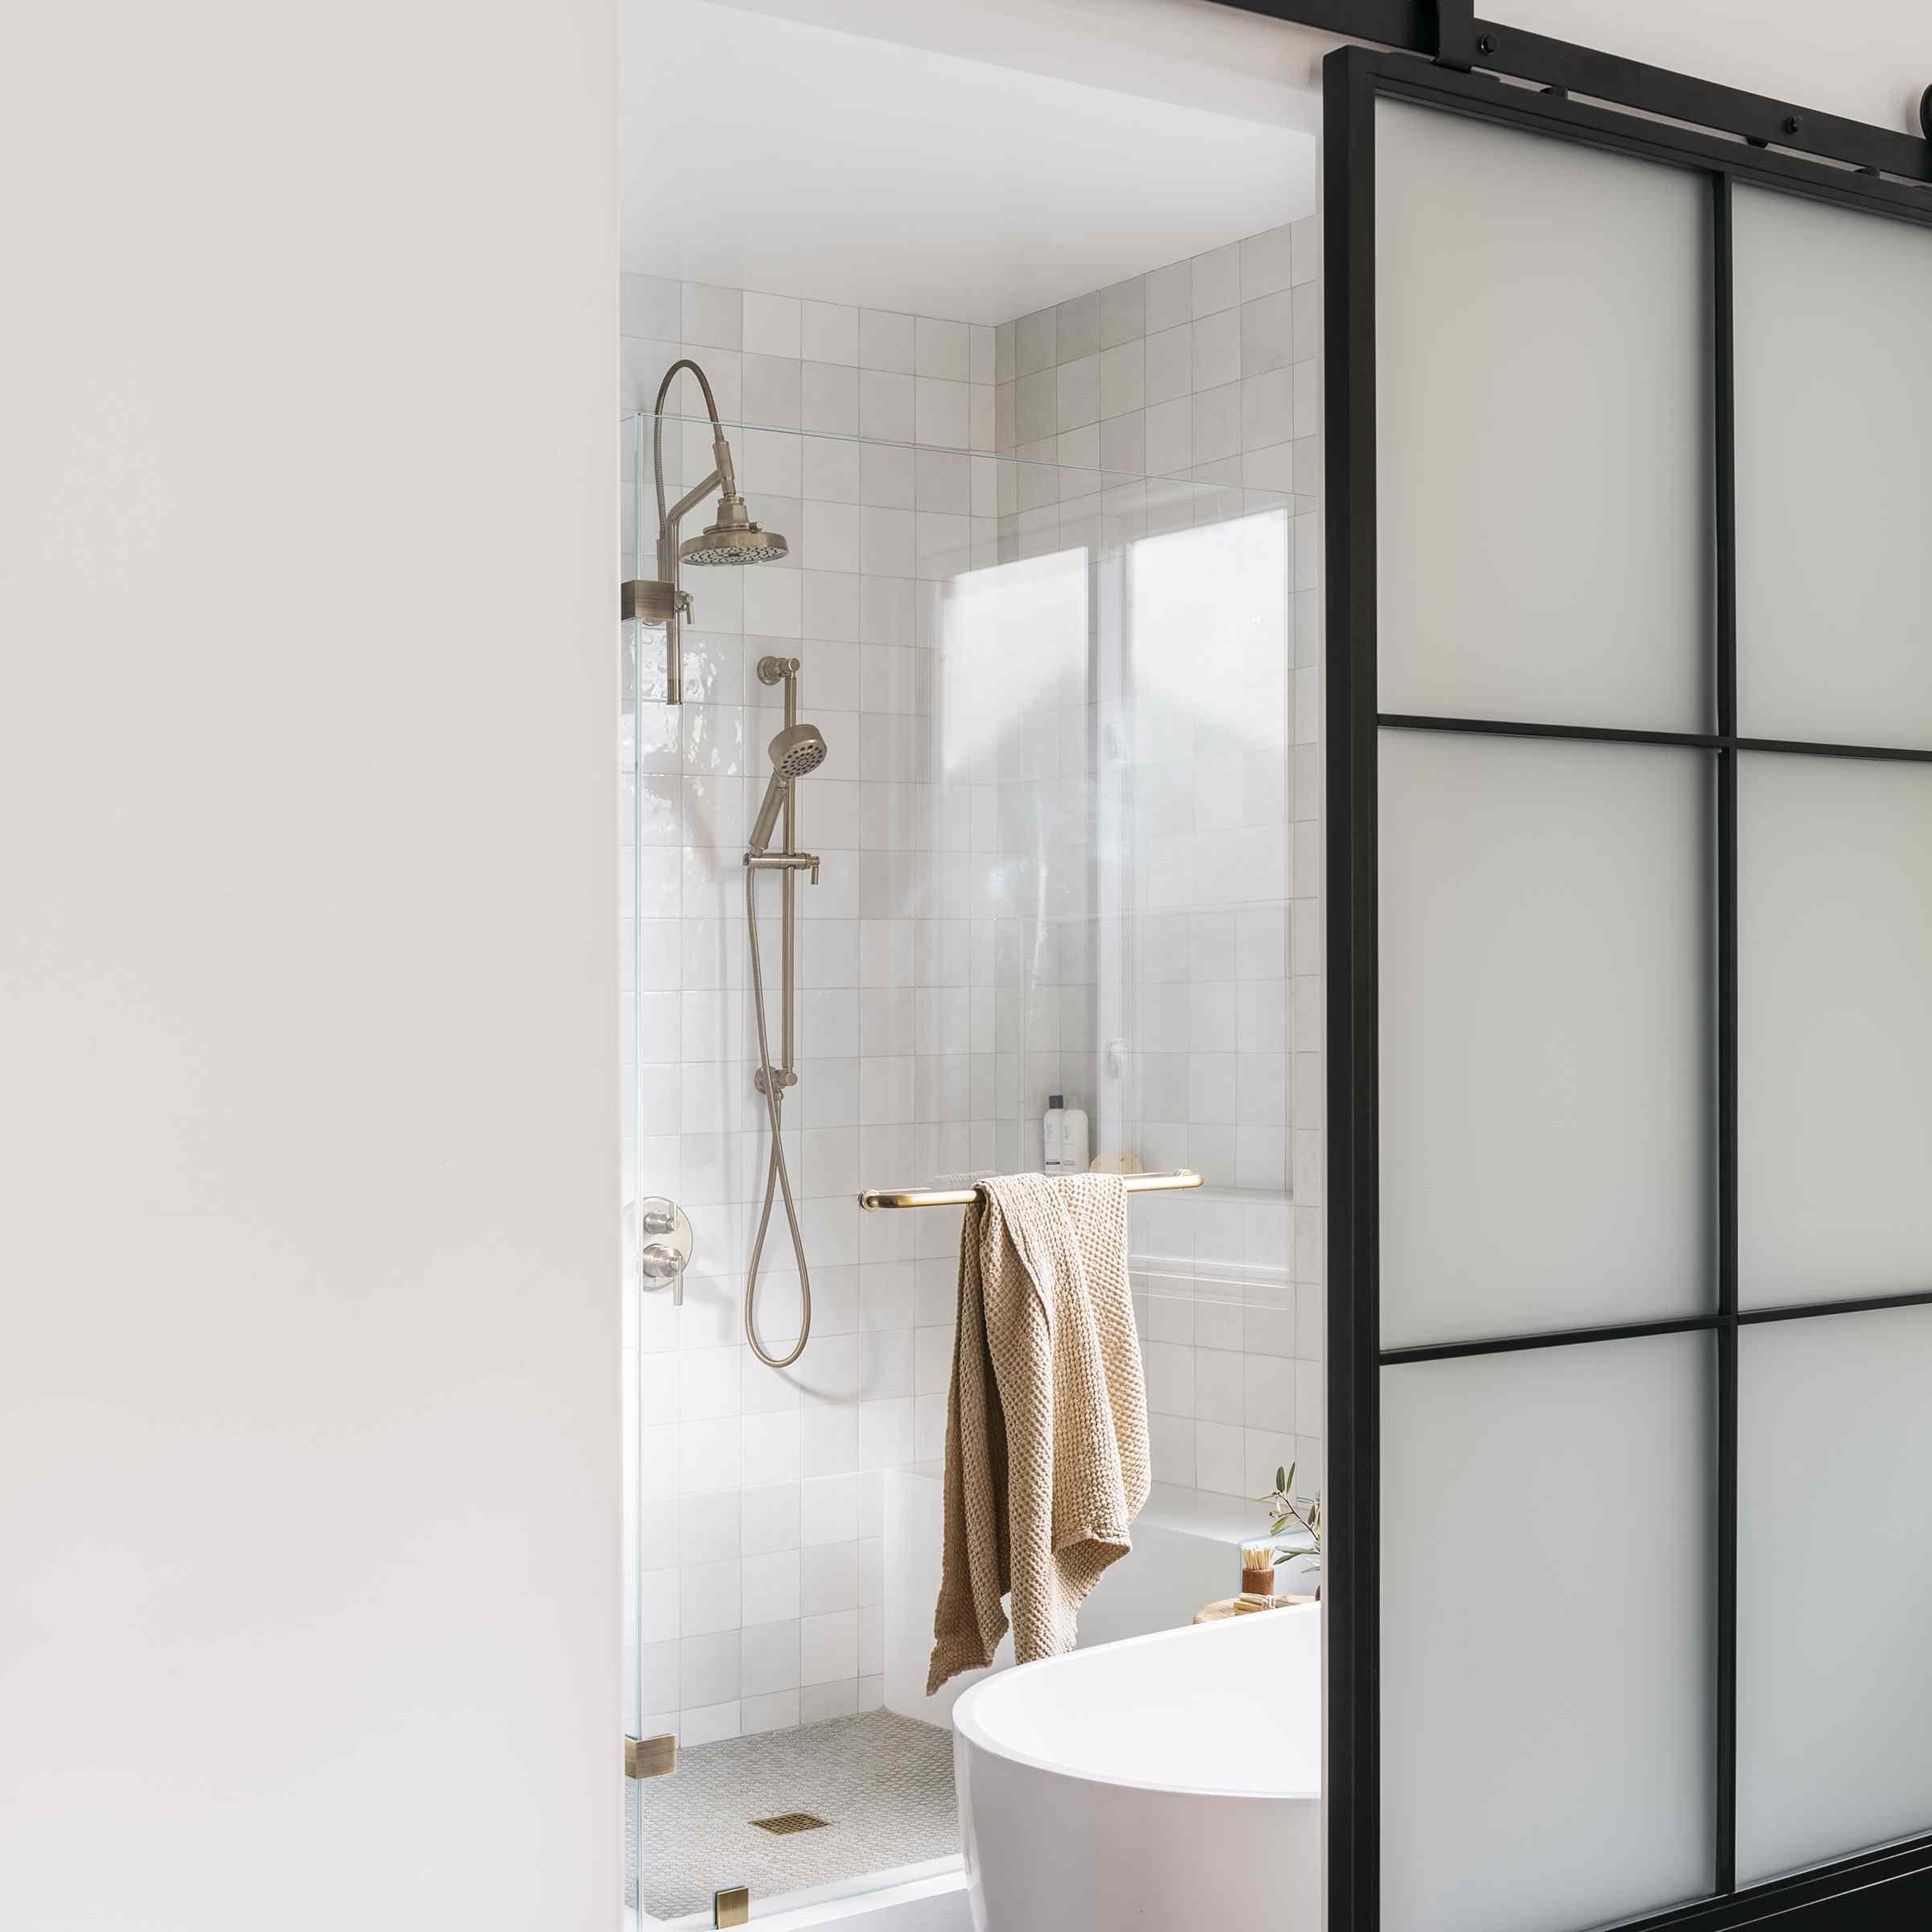 Brett Foken home tour - bathroom with soaking tub and shower